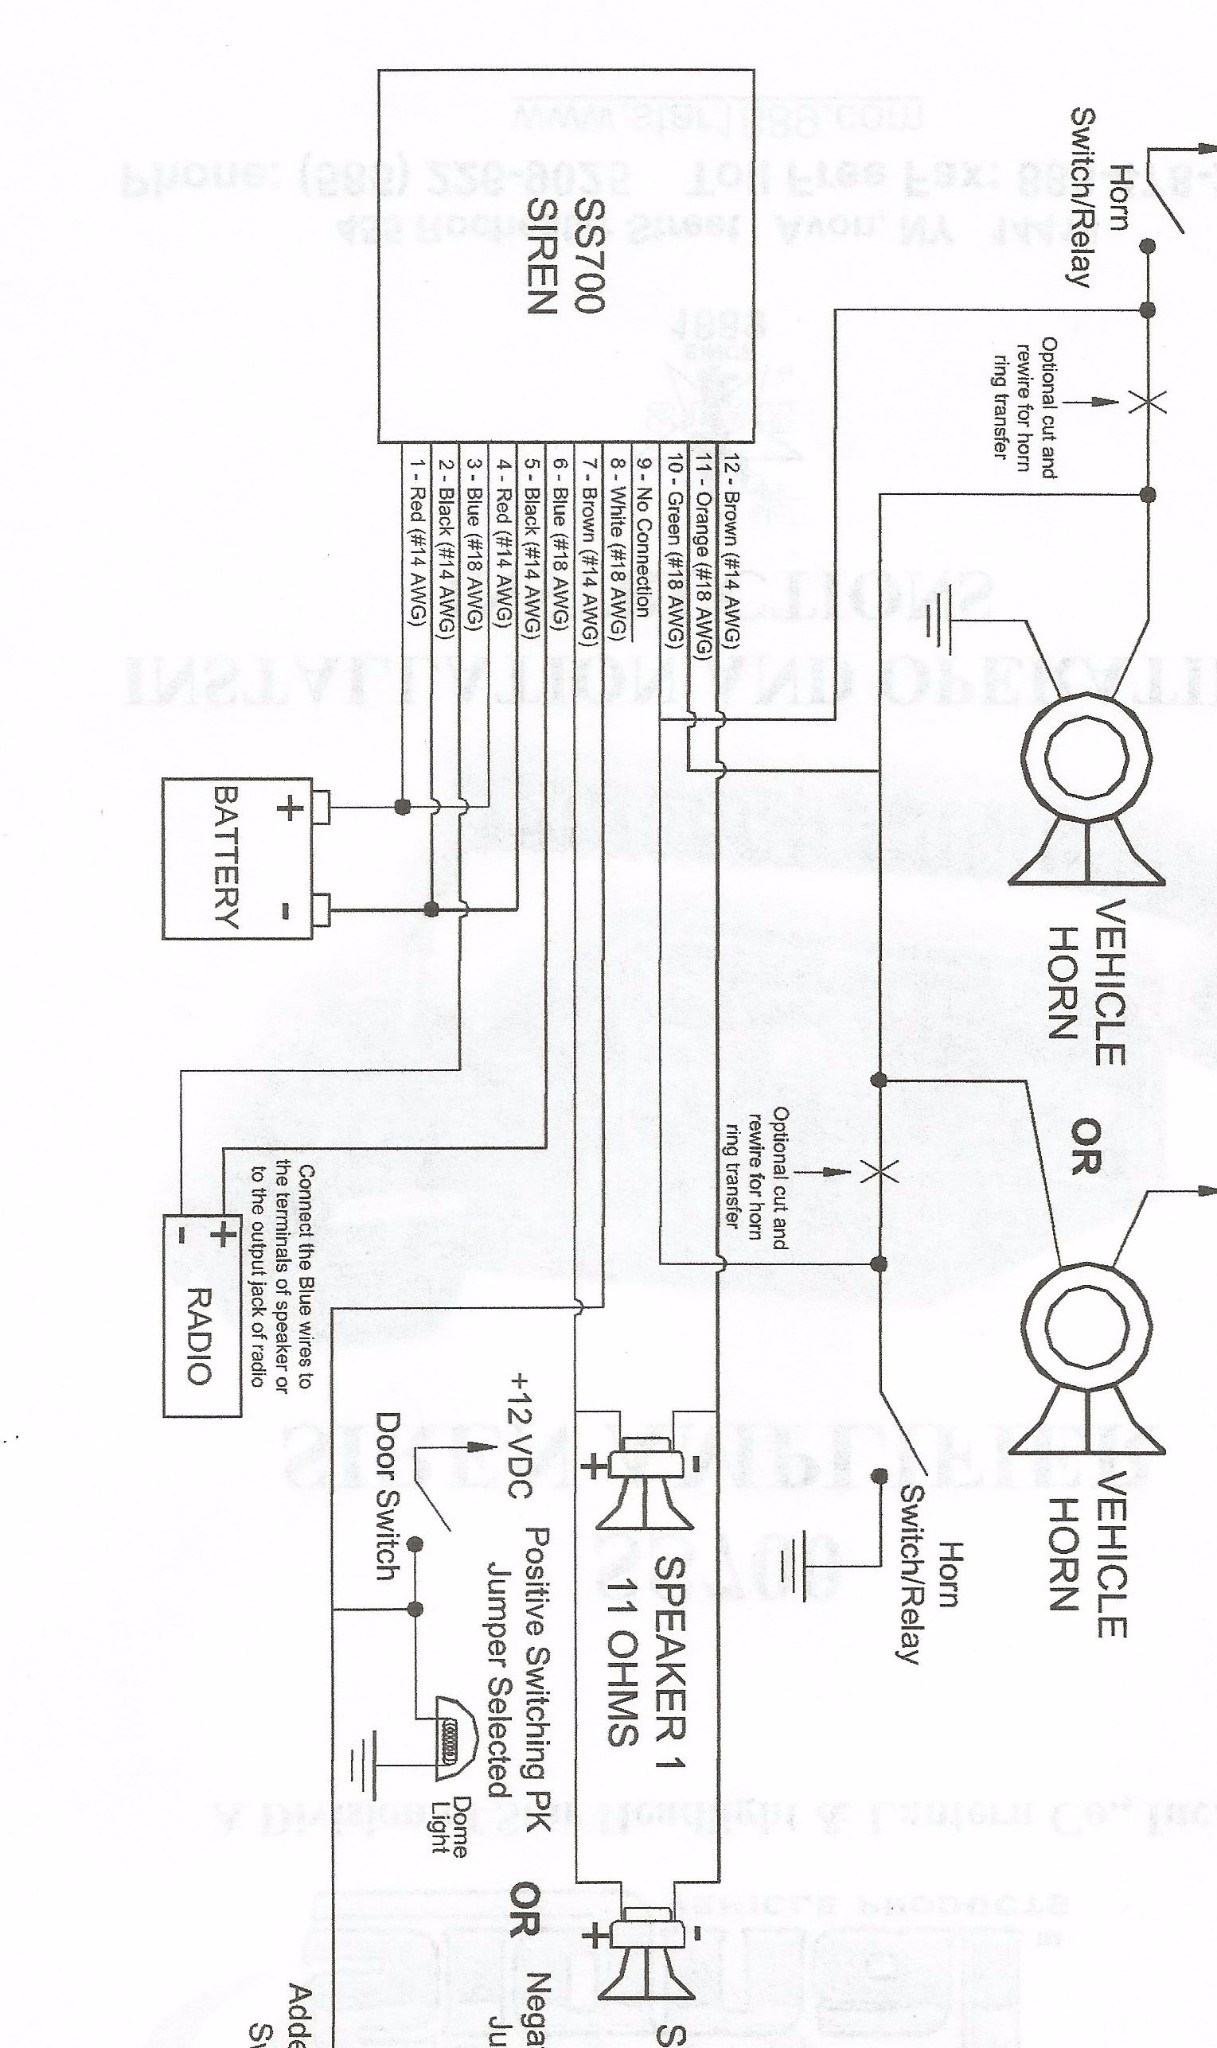 hight resolution of svp siren wiring diagram wiring diagram blog svp siren wiring diagram mace siren wiring diagram wiring